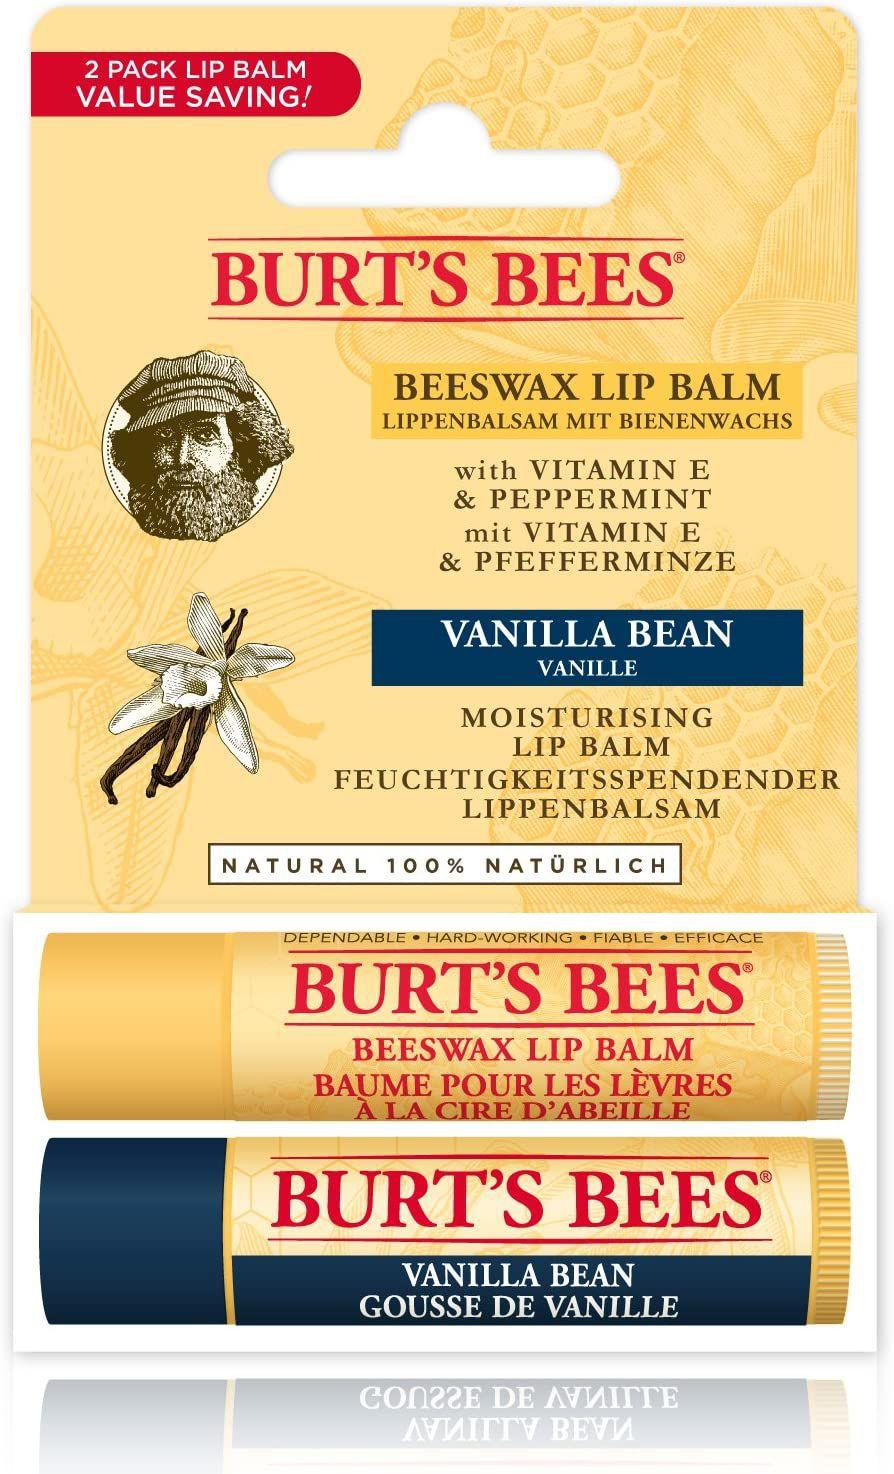 Burt'S Bees Moisturising Lip Balm, Pack of 2 £4.99 @ Amazon (£4.49 p&p np) 25% voucher & 10% s&s £3.24